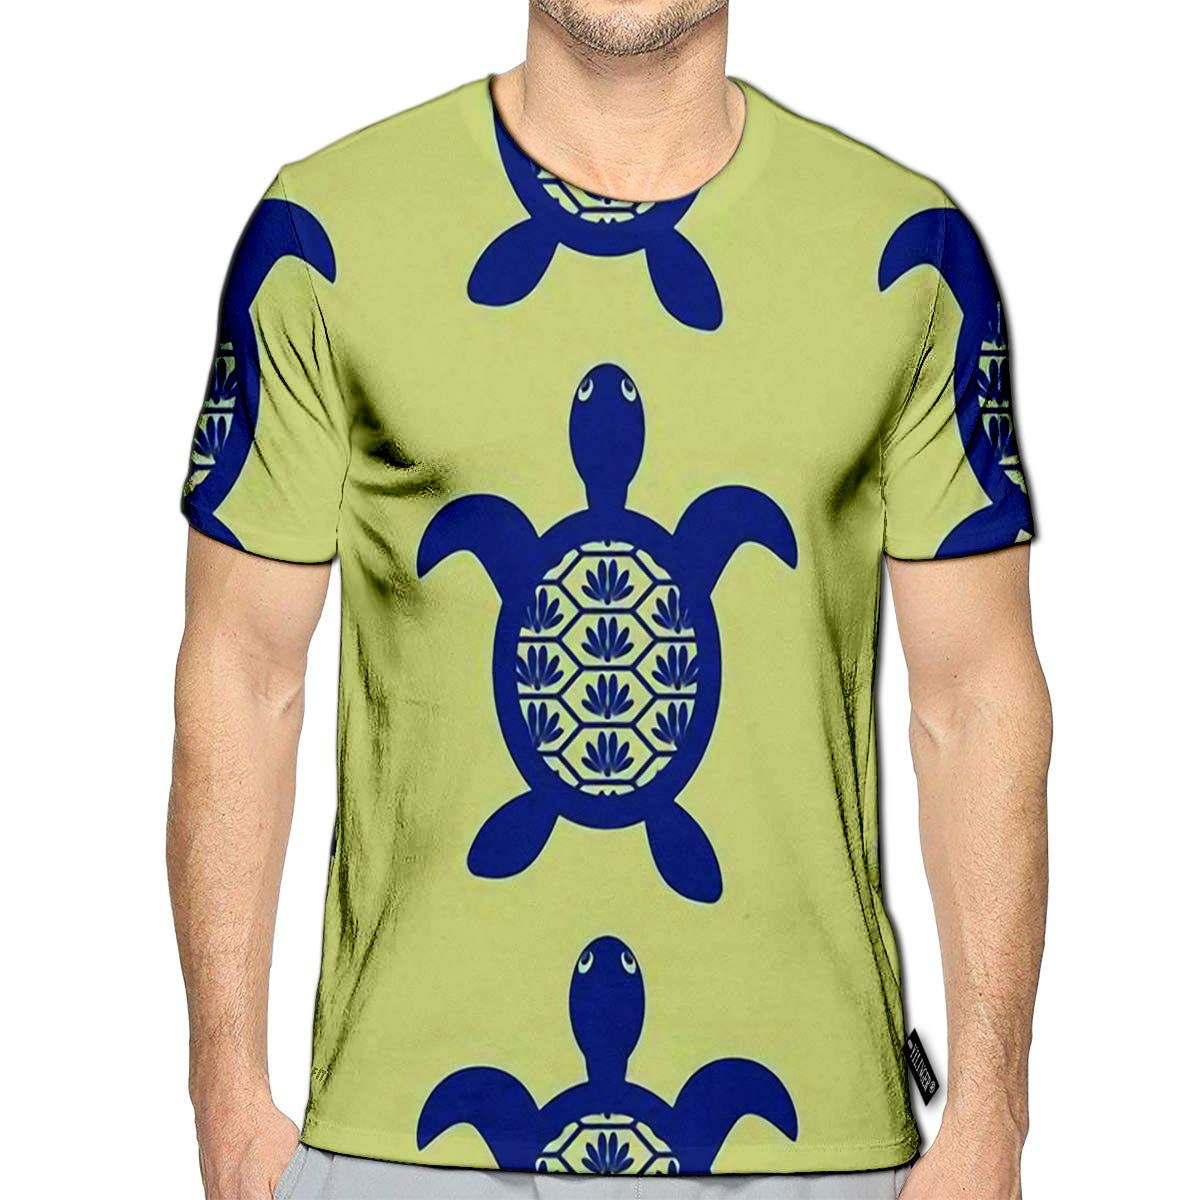 3D Printed T-Shirts Cute Simple Alpaca Pattern Scandinavian Style Short Sleeve Tops Tees